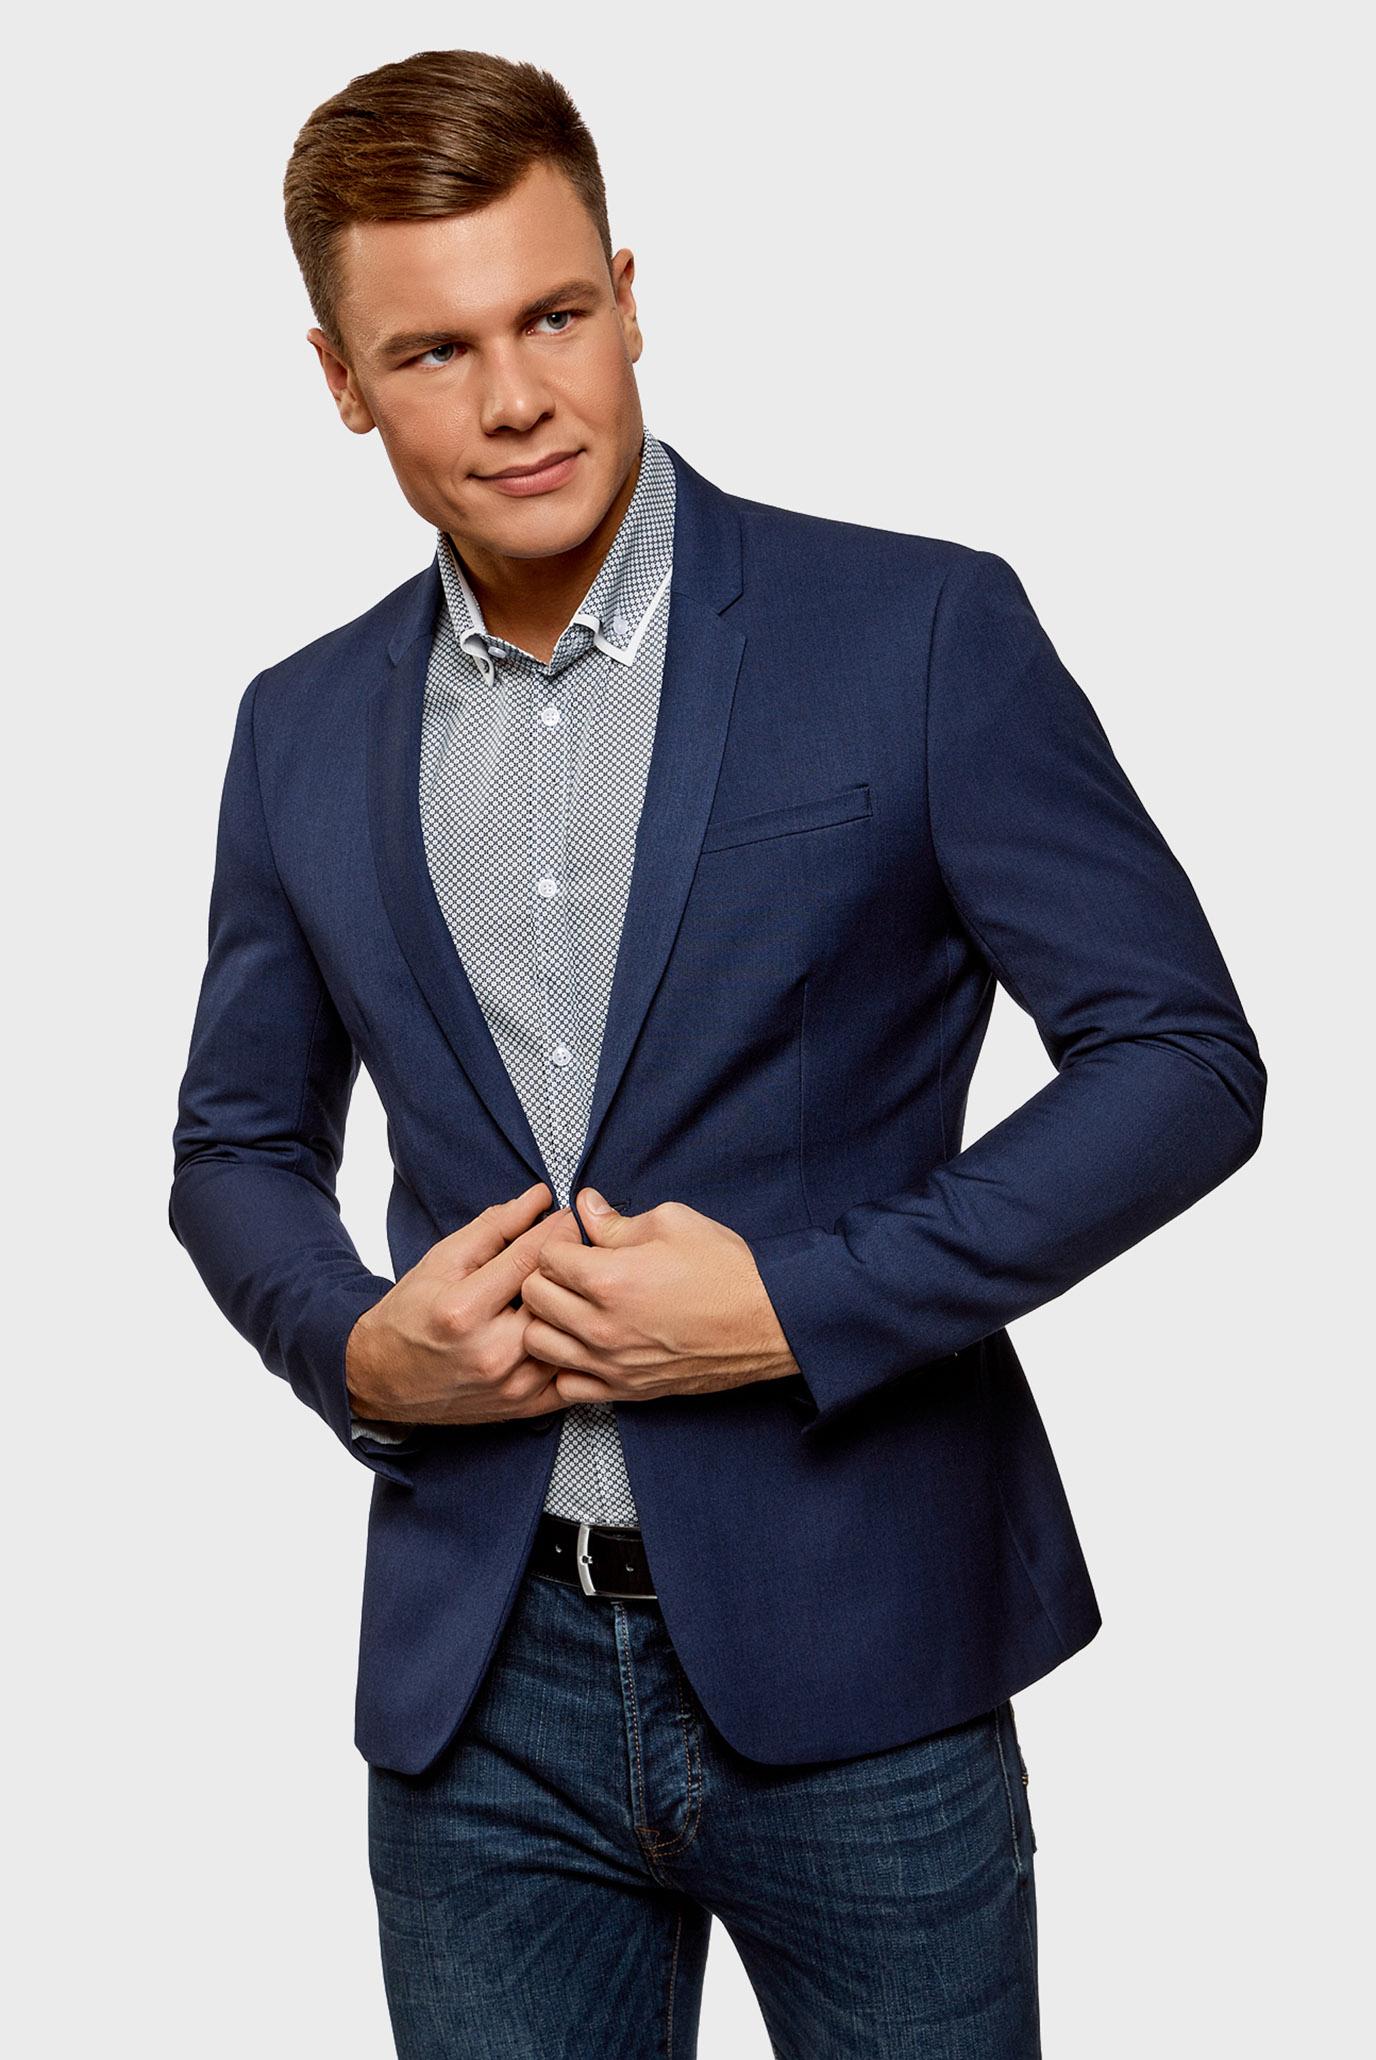 Купить Мужской темно-синий пиджак Oodji Oodji 2B420016M/46317N/7800N – Киев, Украина. Цены в интернет магазине MD Fashion